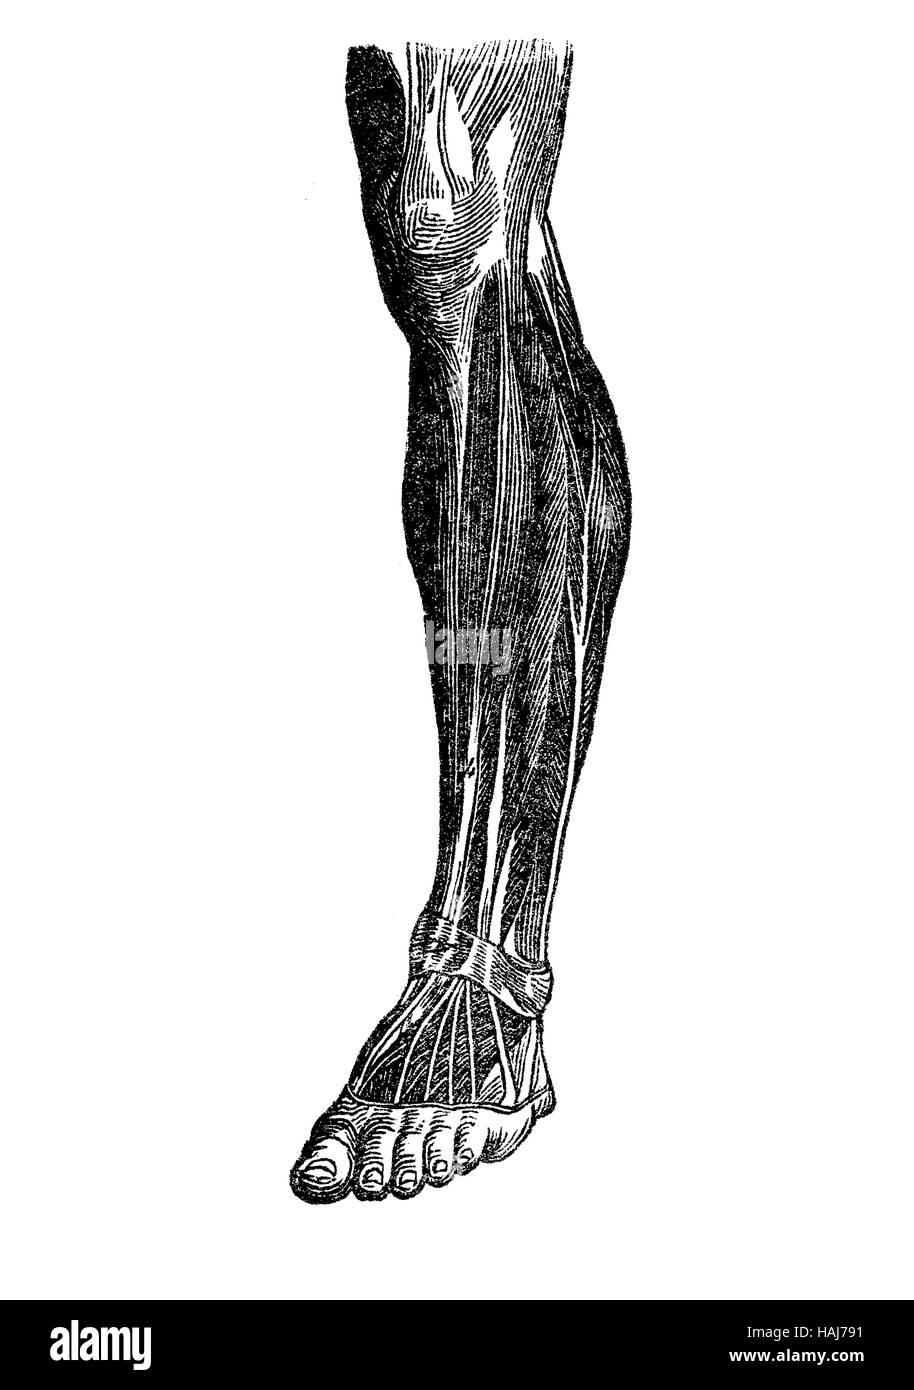 Human Foot Anatomy Stockfotos & Human Foot Anatomy Bilder - Alamy